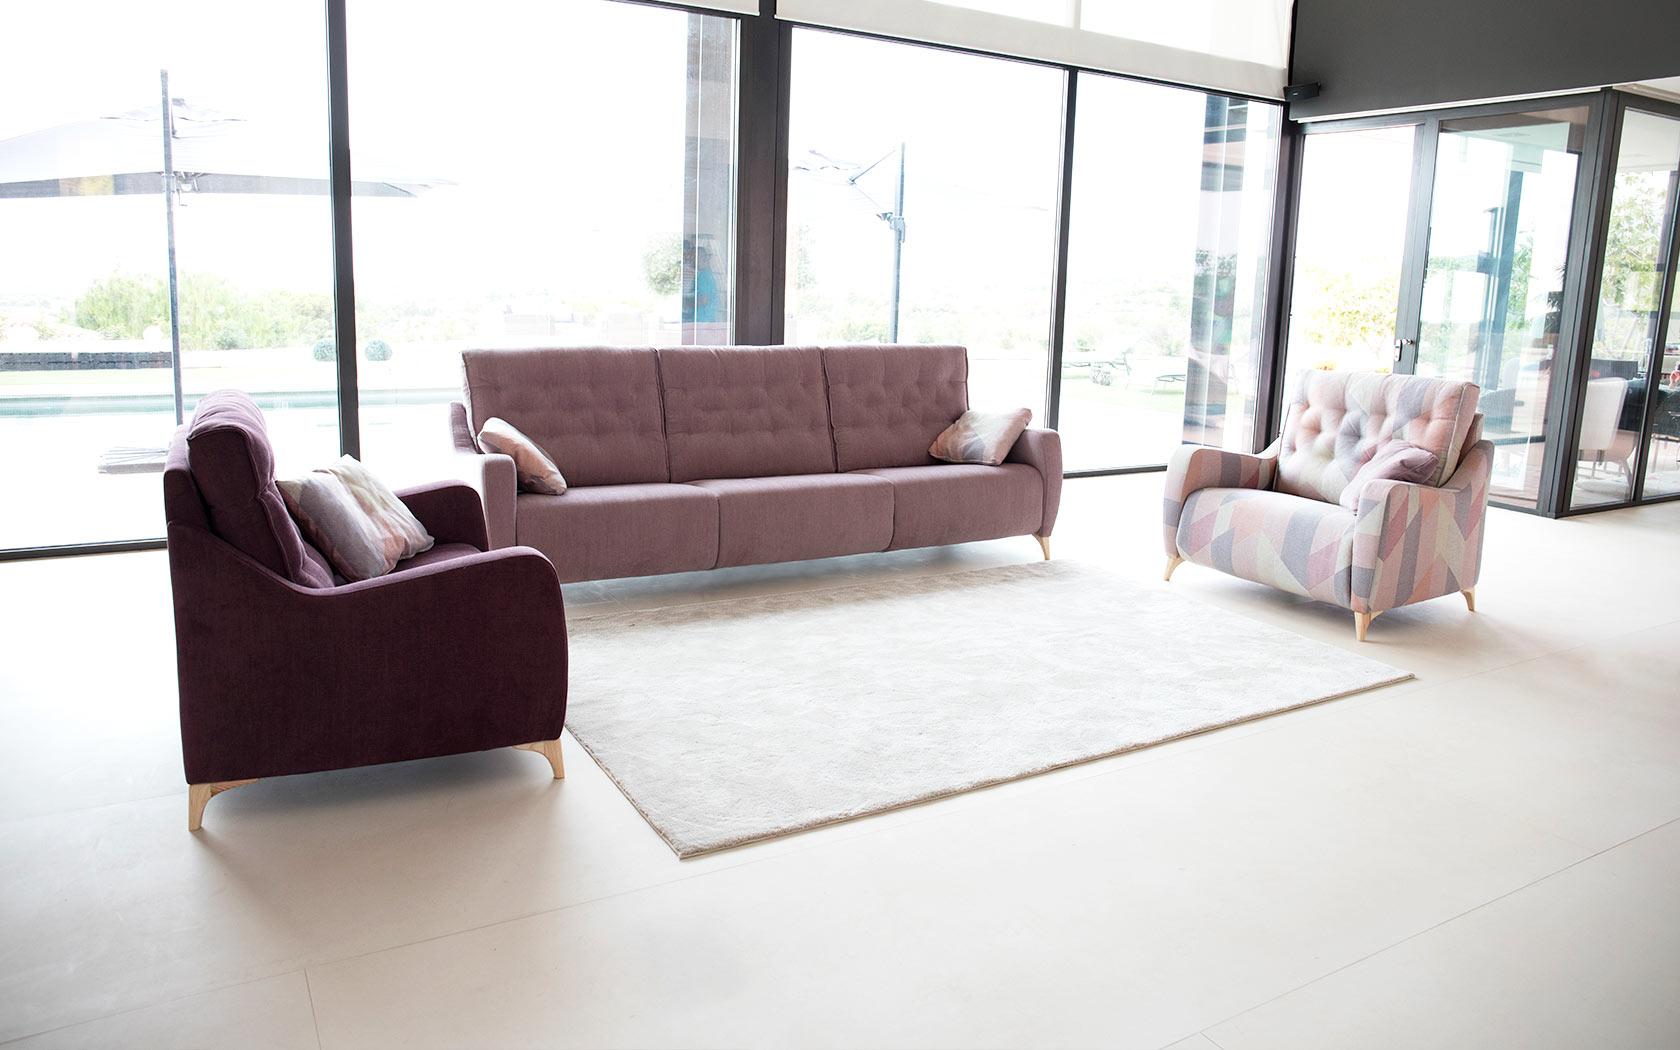 Avalon sofa relax 2019 01